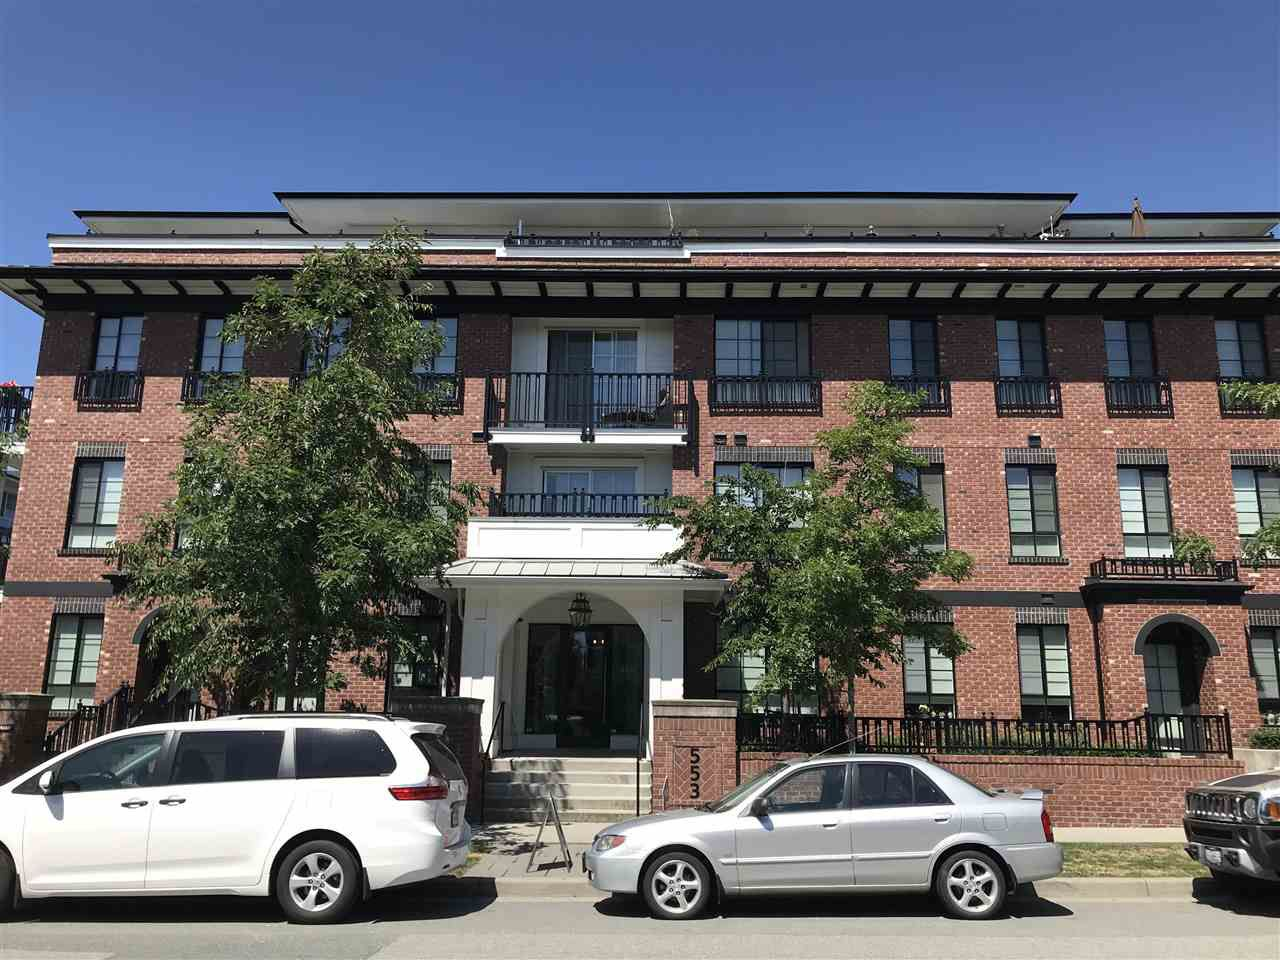 Main Photo: 205 553 FOSTER Avenue in Coquitlam: Coquitlam West Condo for sale : MLS®# R2287864